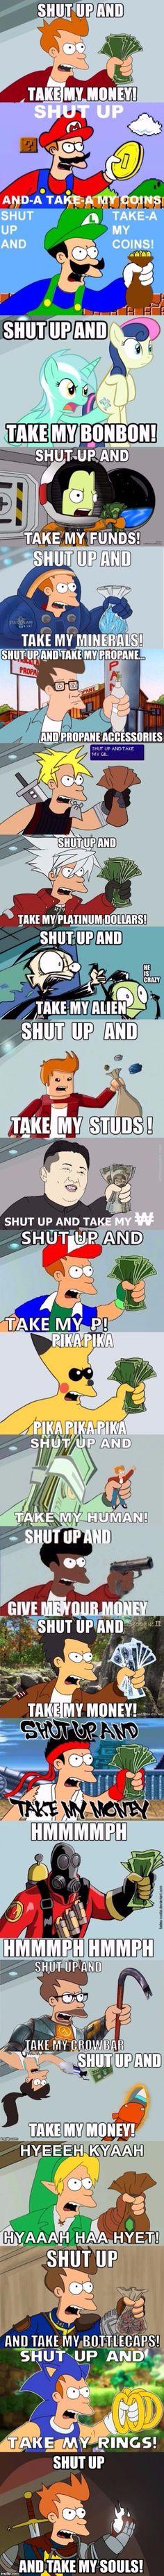 Shut Up Revolution Has Begun! (New & Improved)   .   image tagged in shut up revolution has begun,memes,shut up and take my money,shut up and take my money fry,futurama fry,fry   made w/ Imgflip meme maker